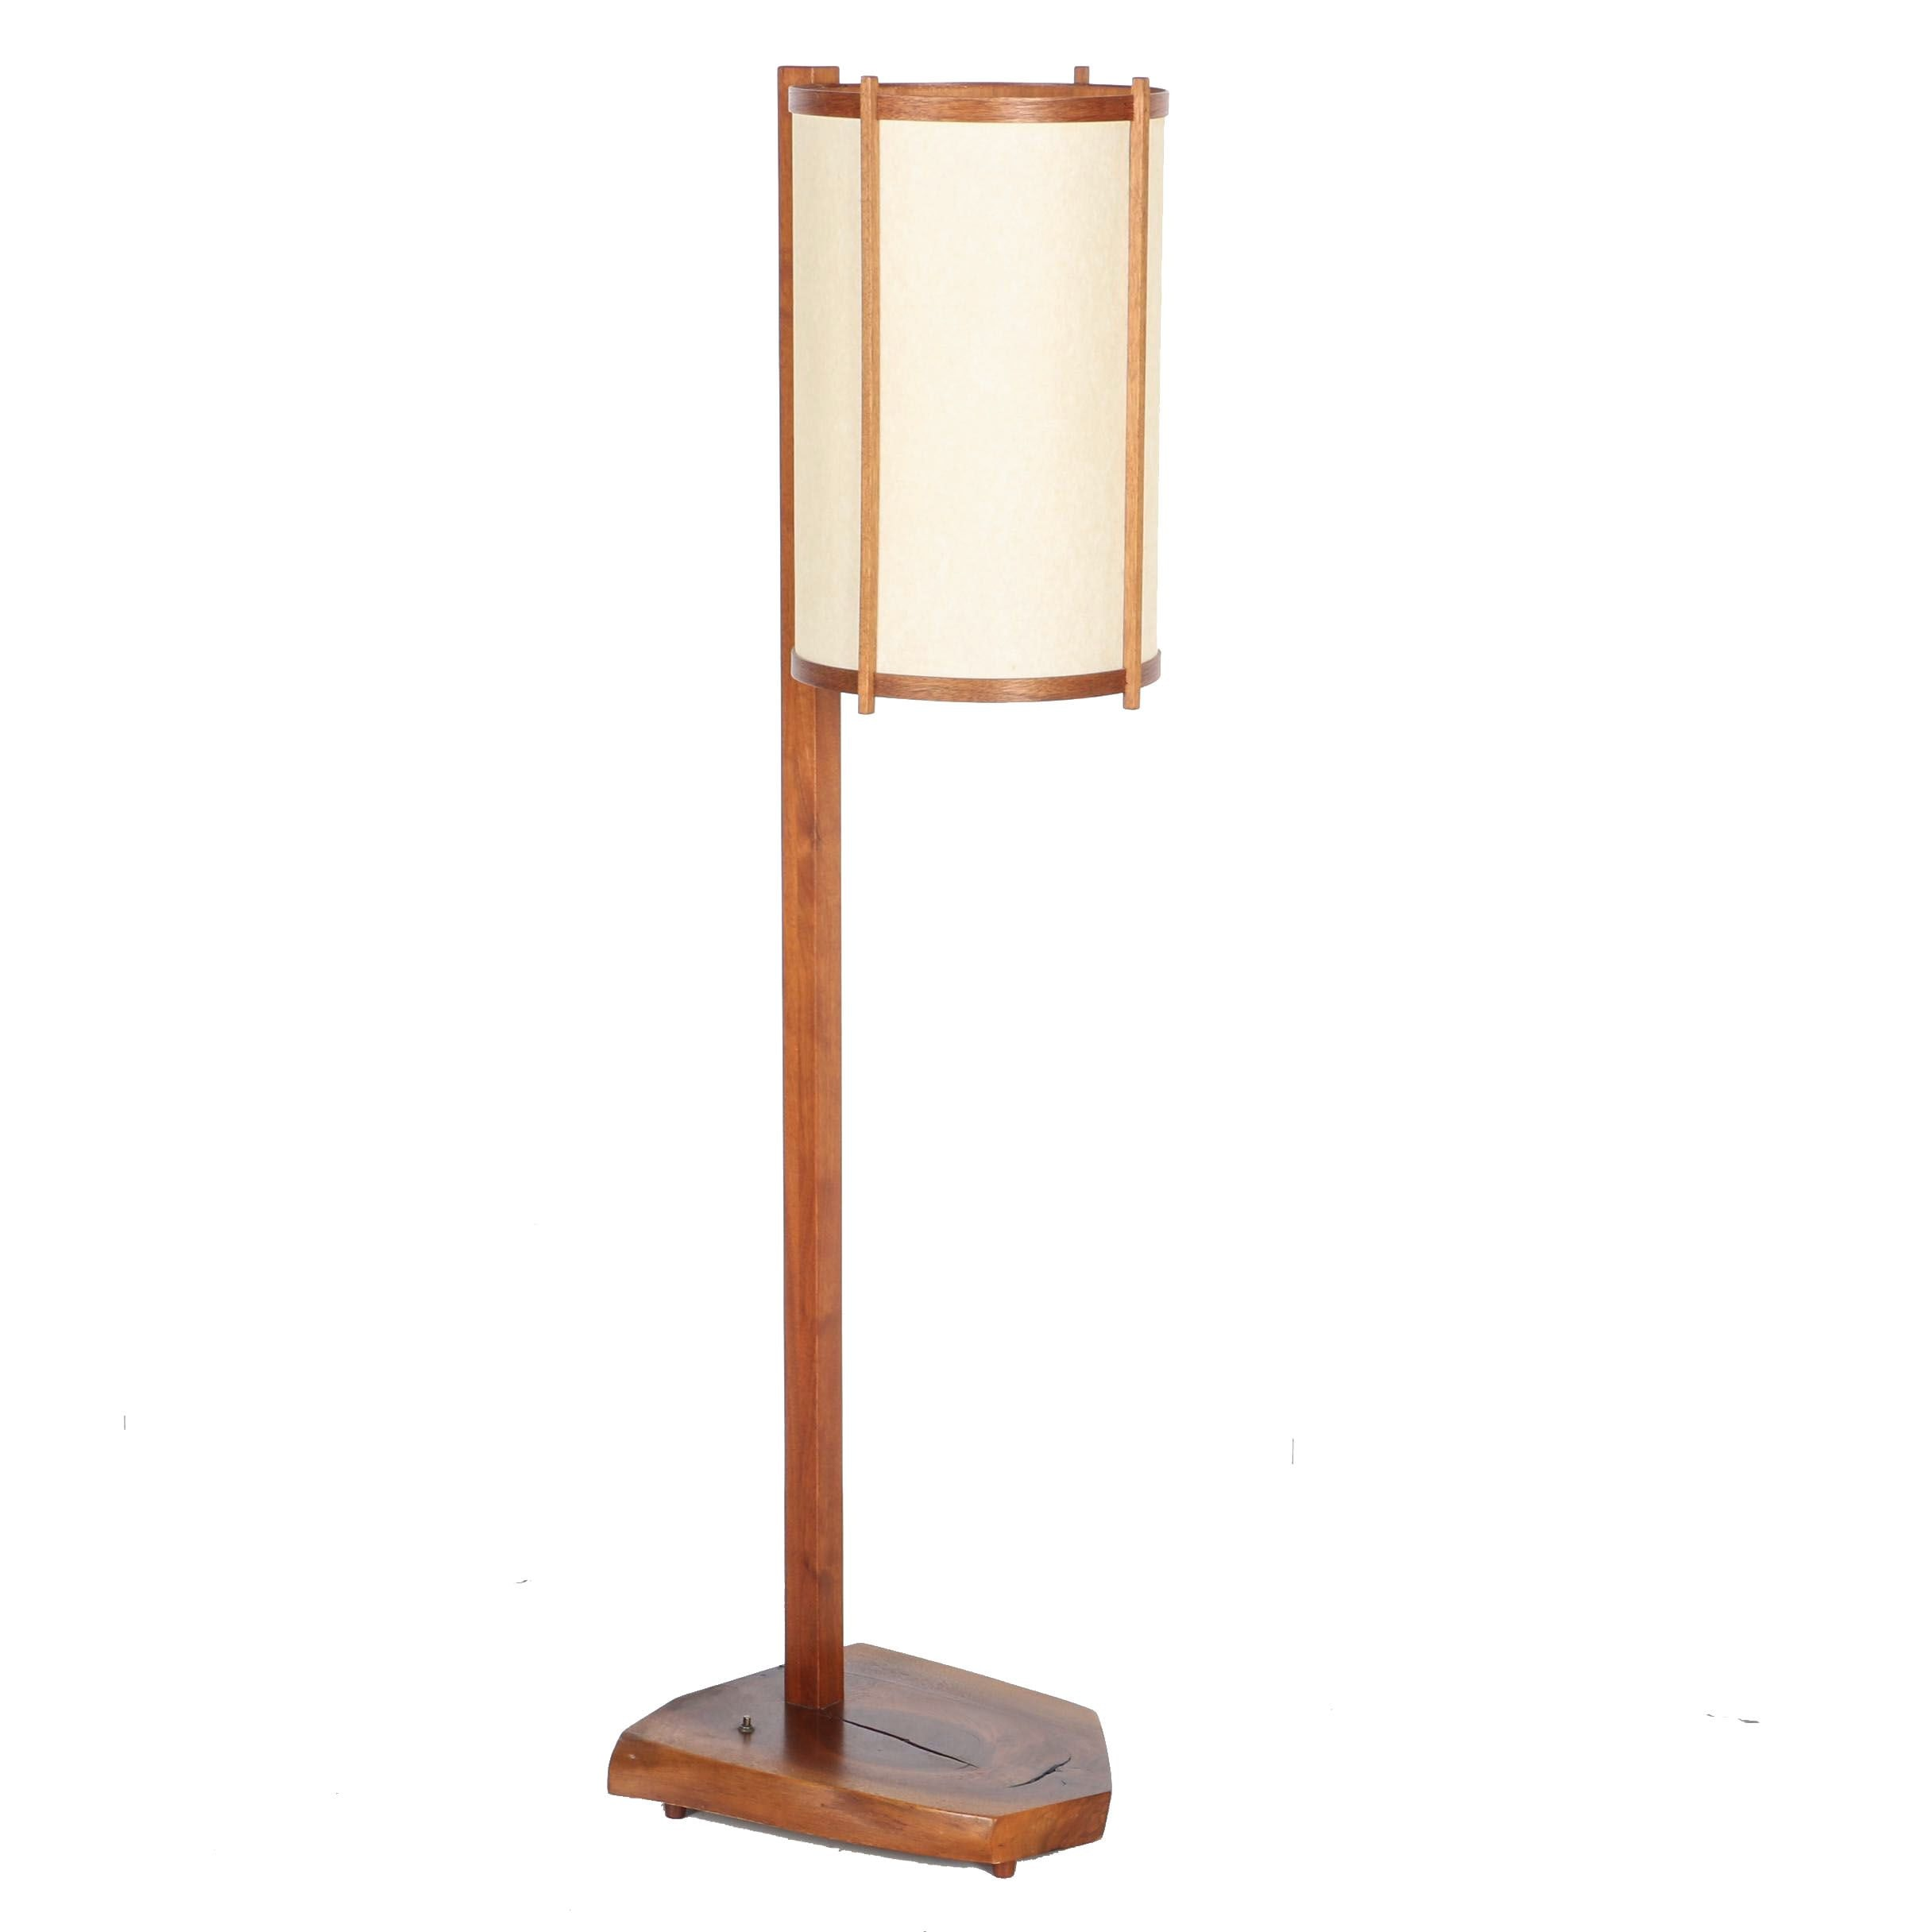 Vintage George Nakashima Floor Lamp With Provenance